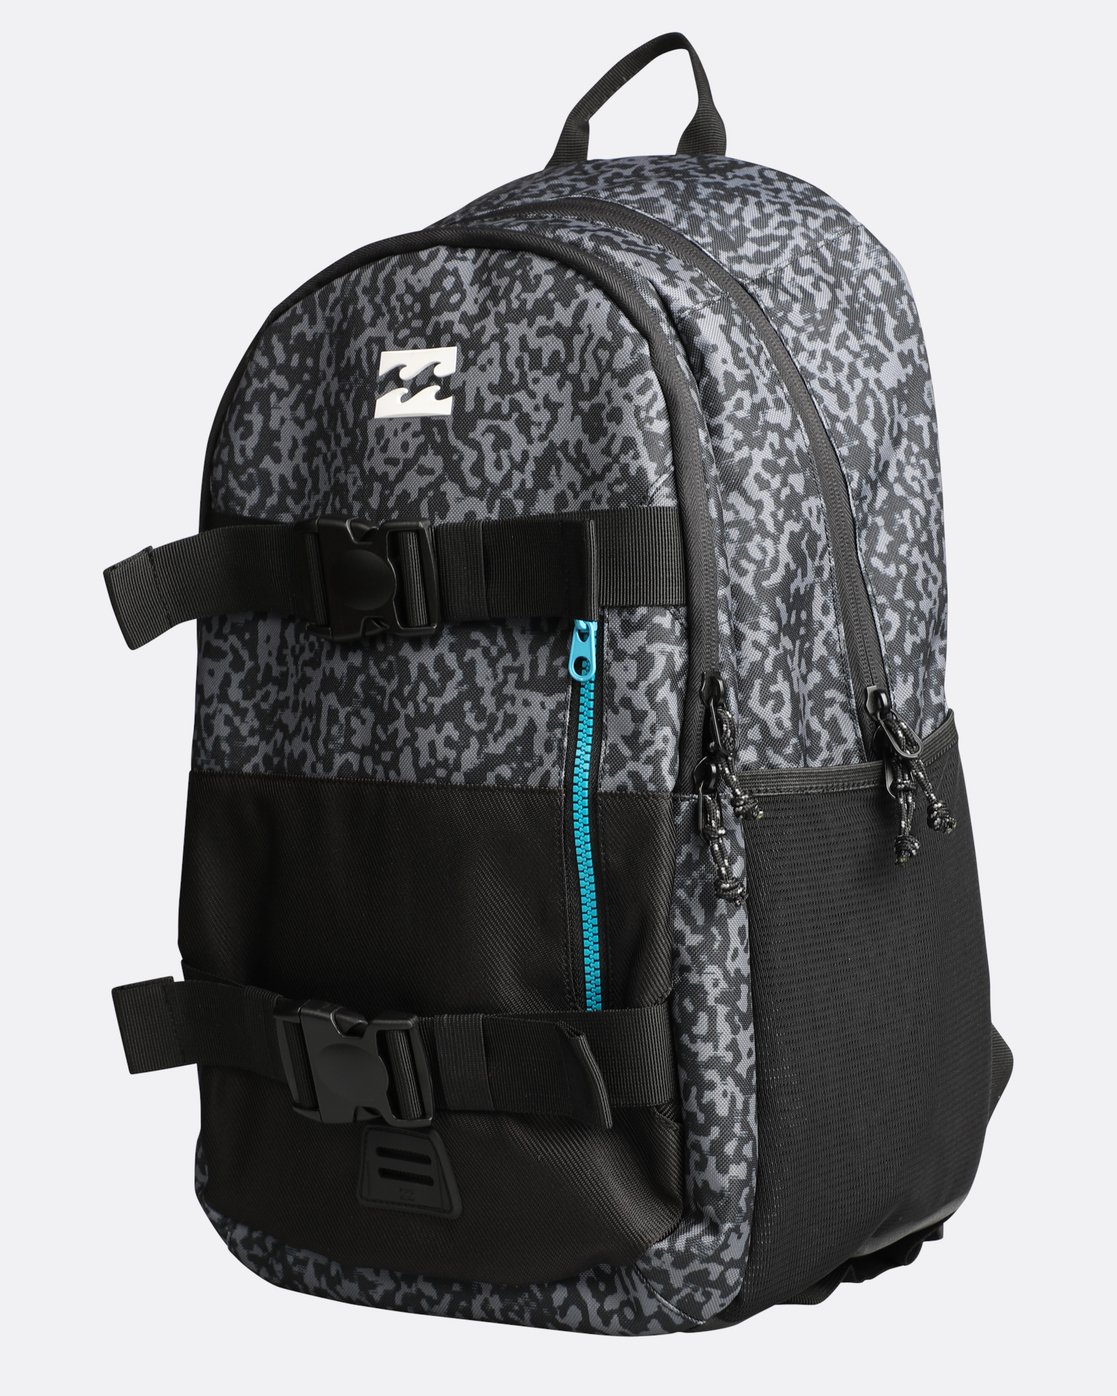 abf9409635 Command Skate Pack Backpack